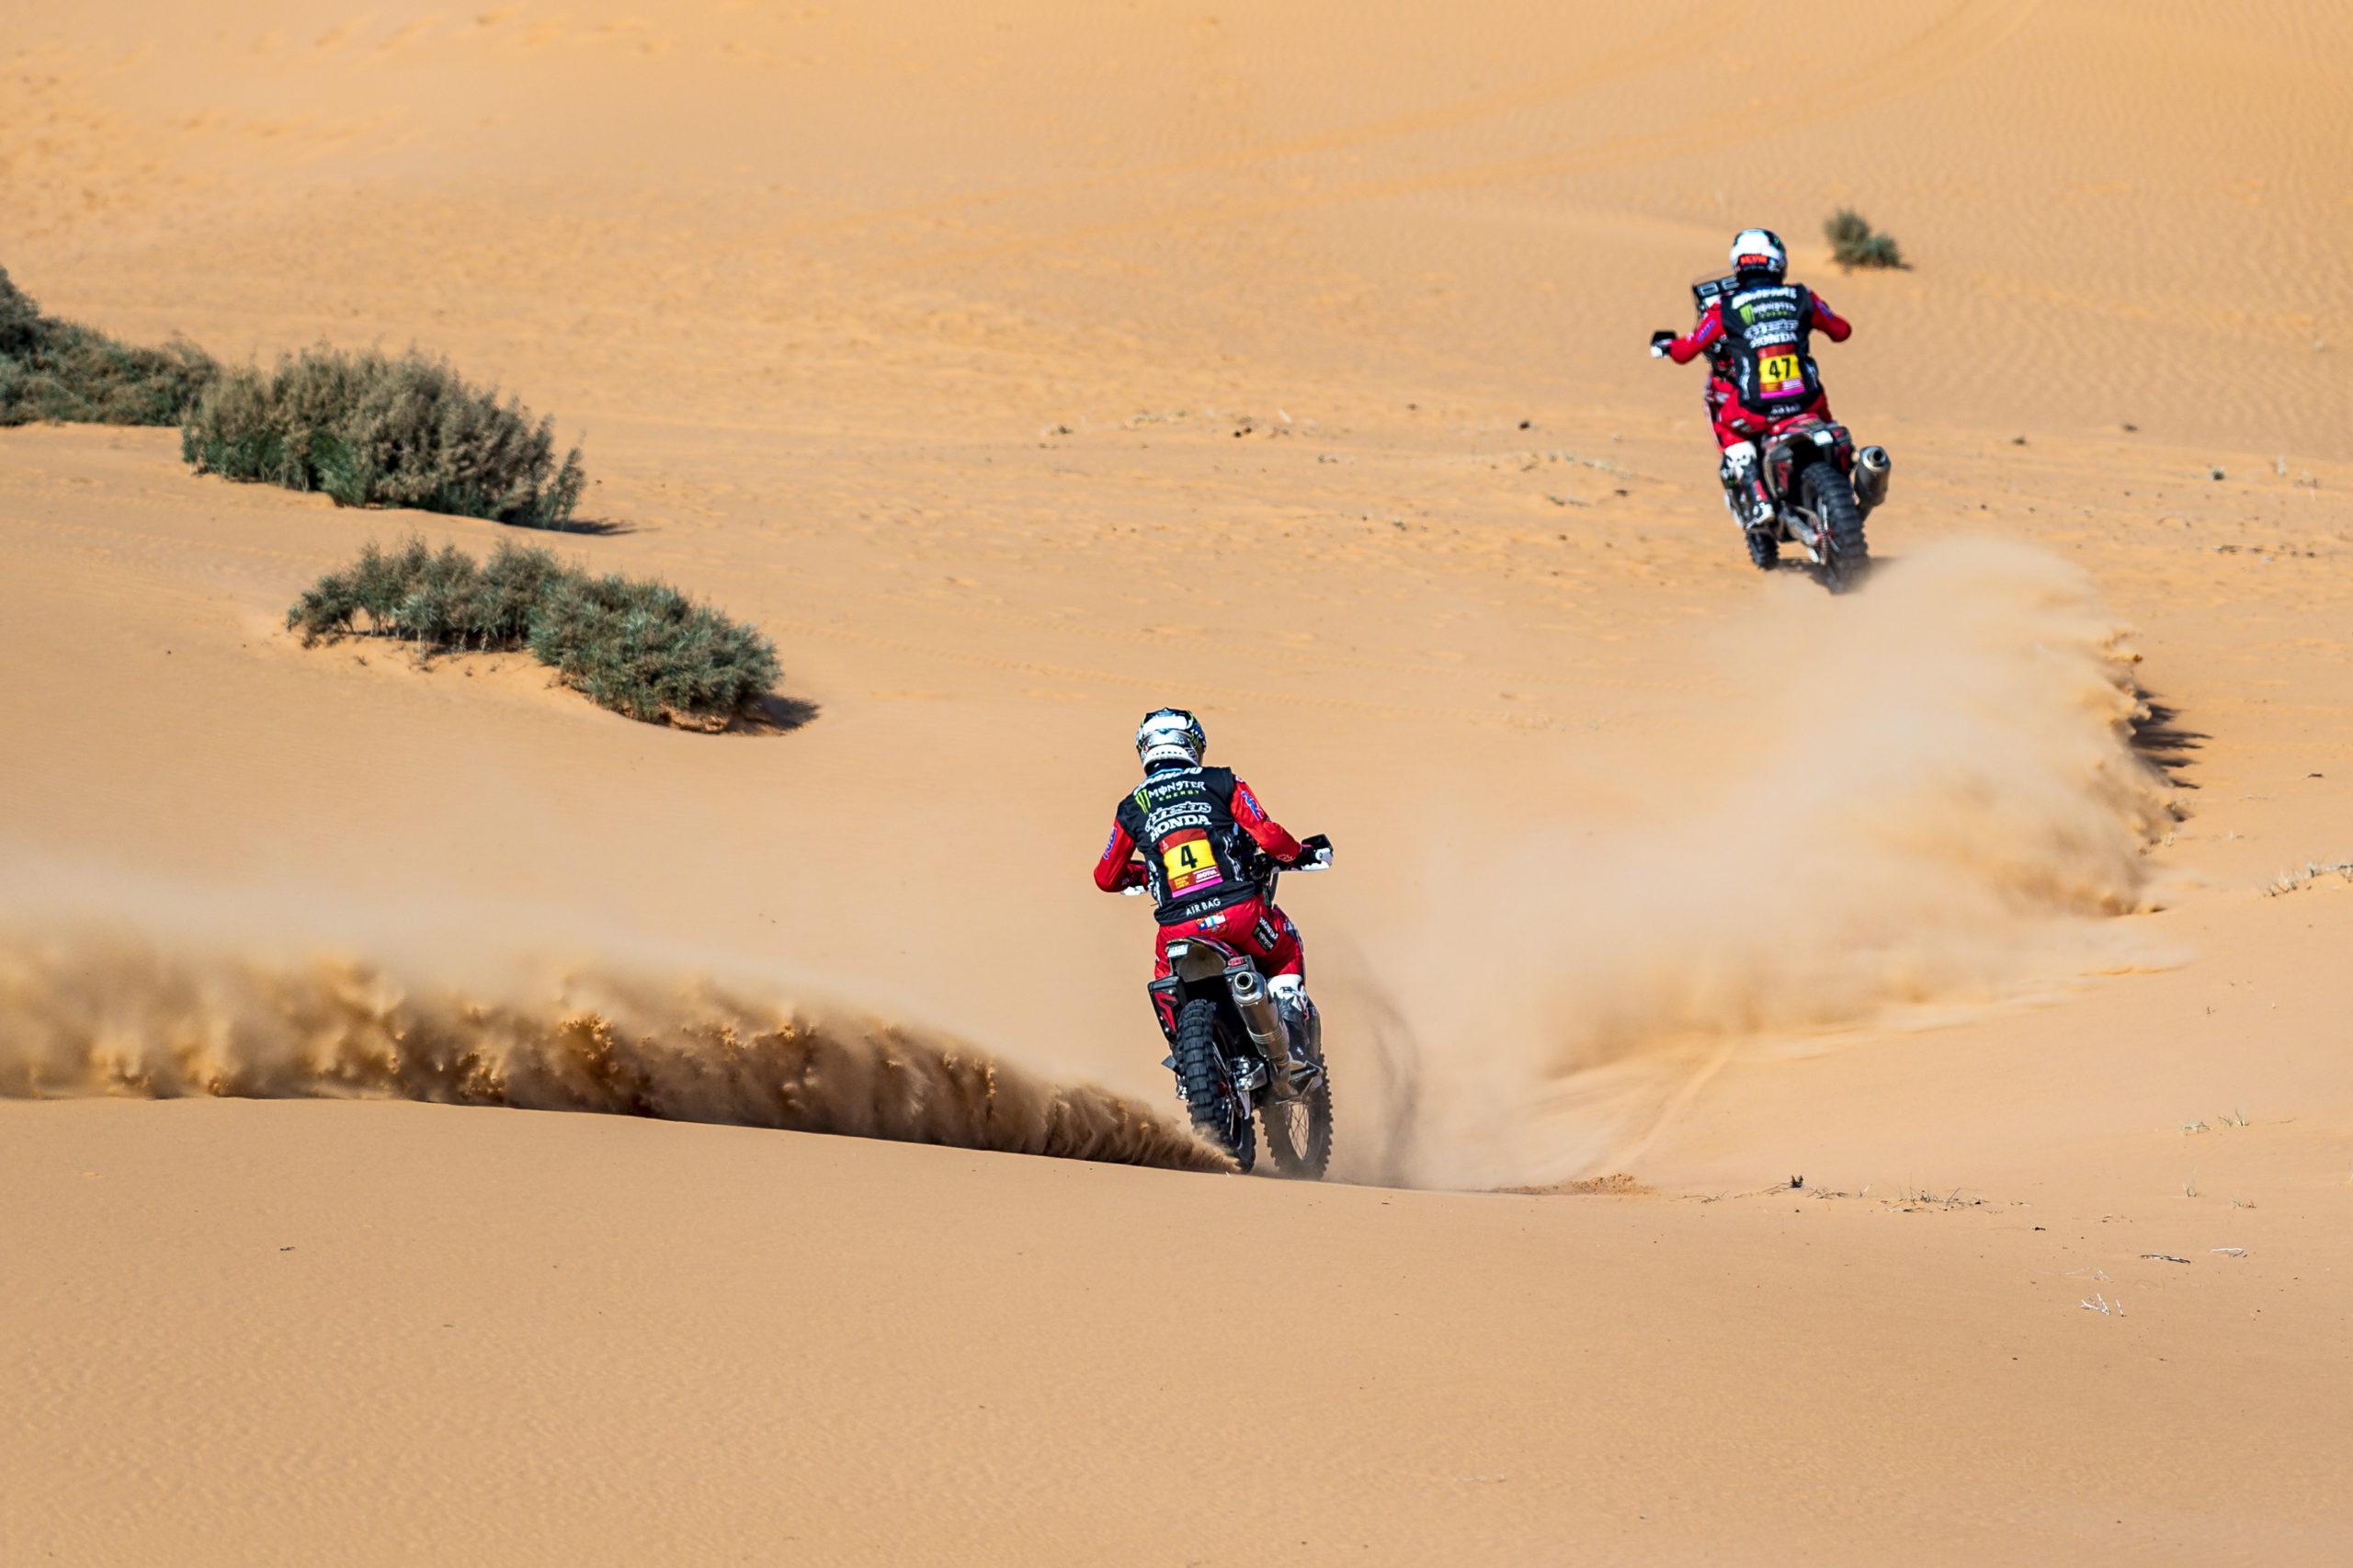 Kevin Benavides, Ricky Brabec, Honda HRC, Dakar 2021